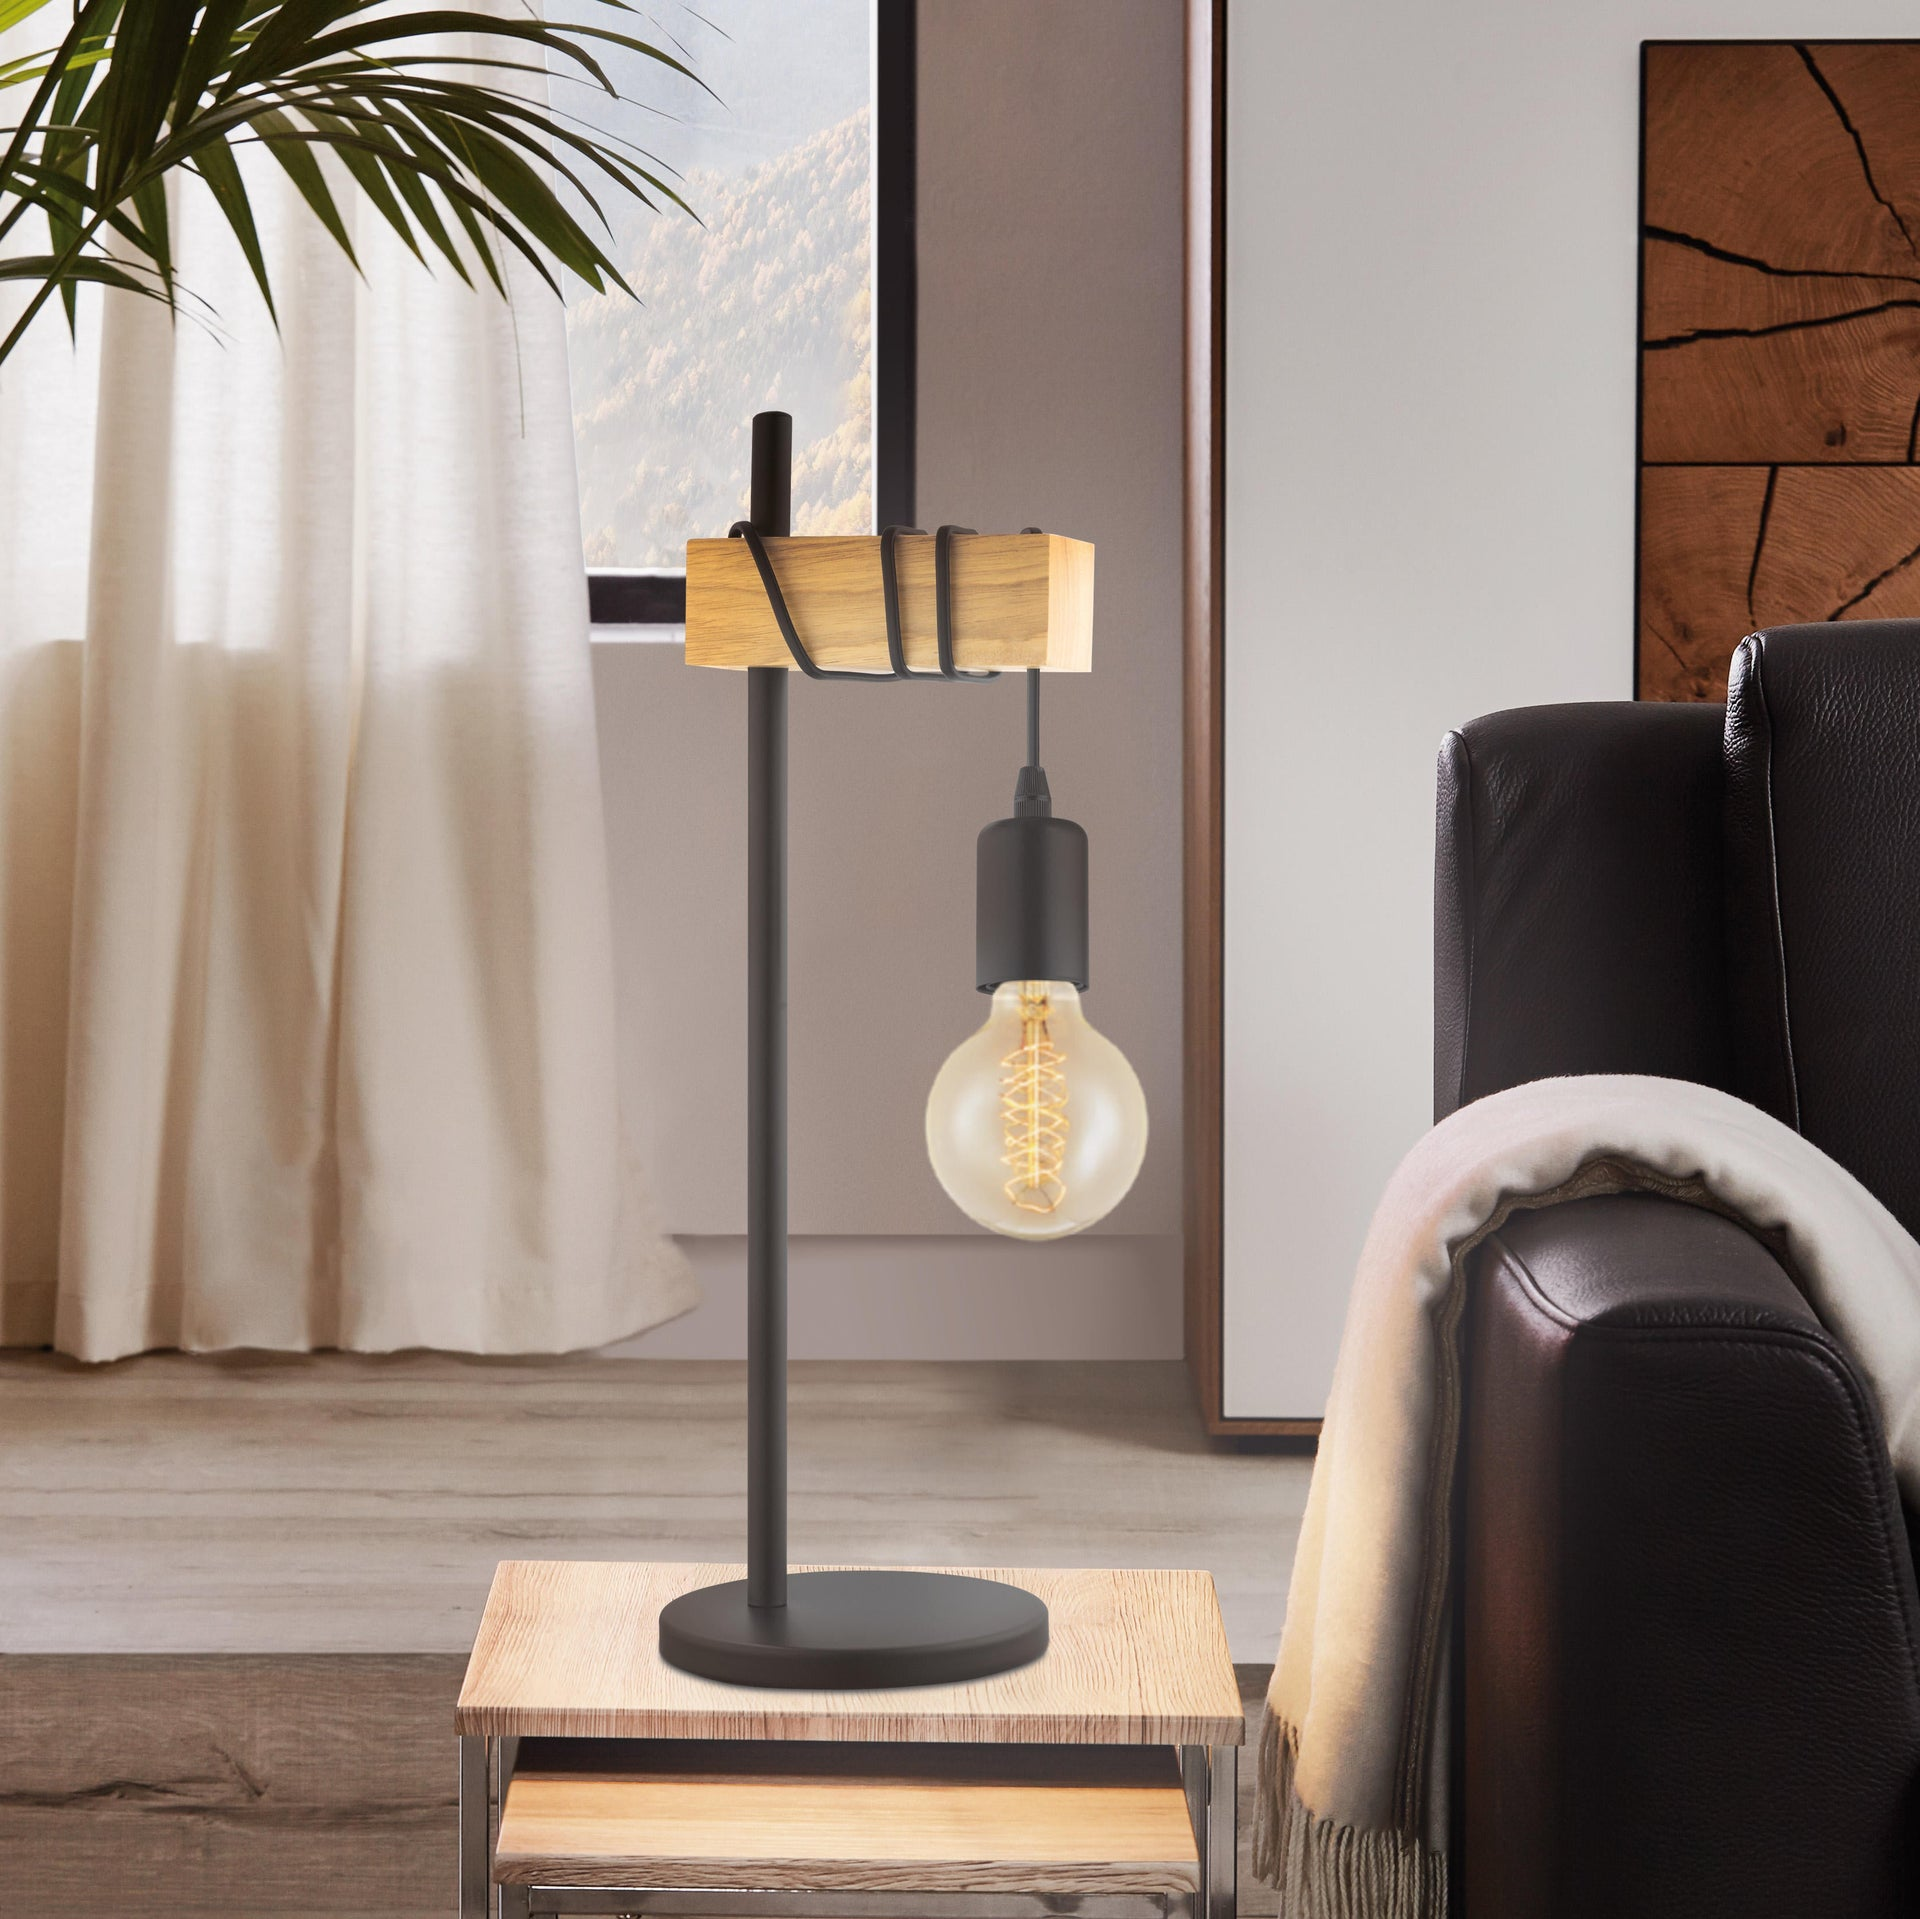 Lampada da tavolo Scandinavo Townshend nero , in metallo, EGLO - 1